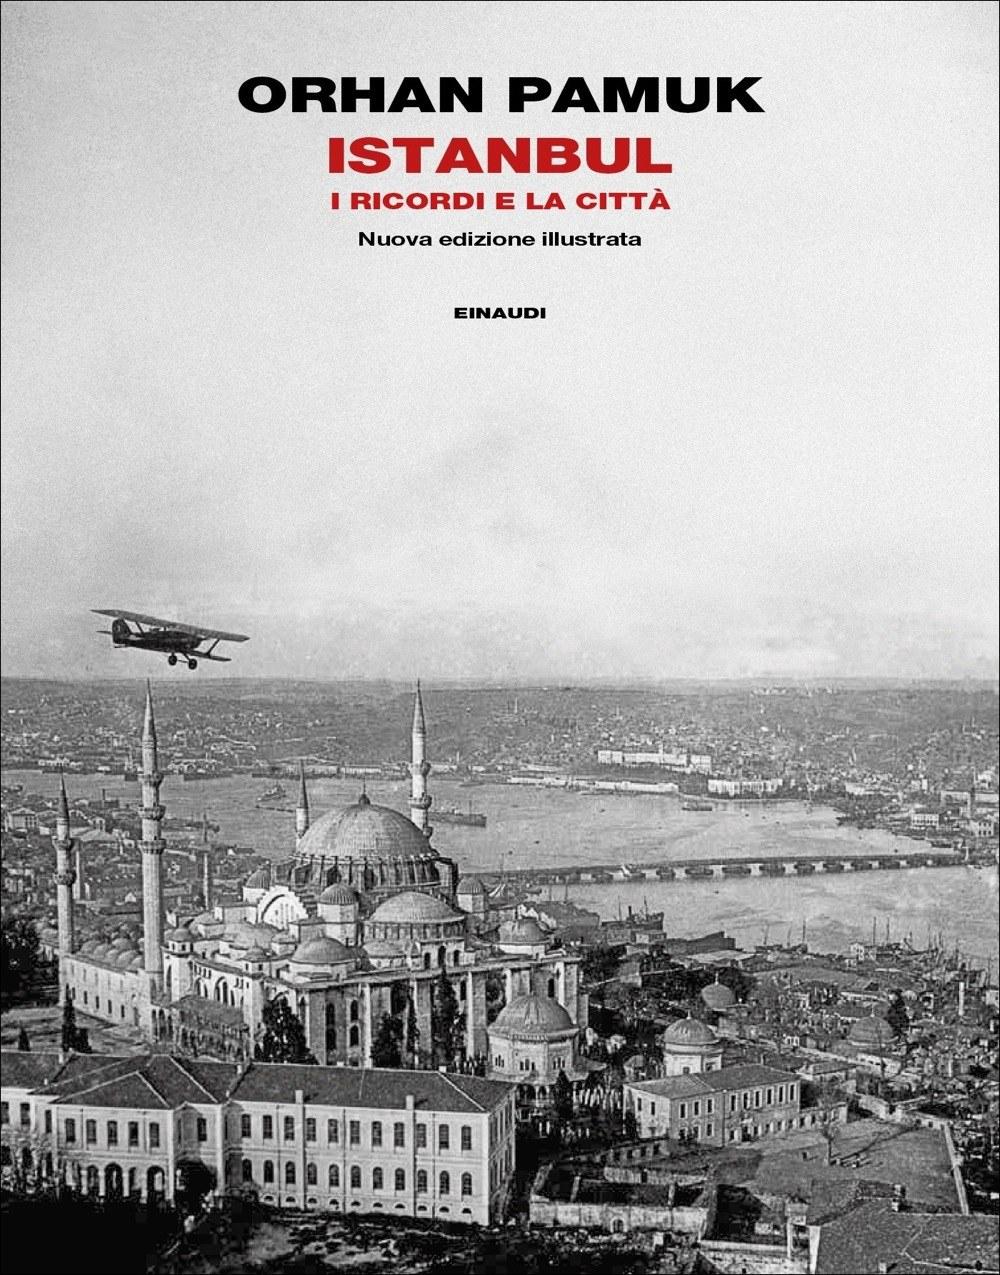 O. Pamuk, Istanbul. I ricordi e la città, Torino, Einaudi, 2017